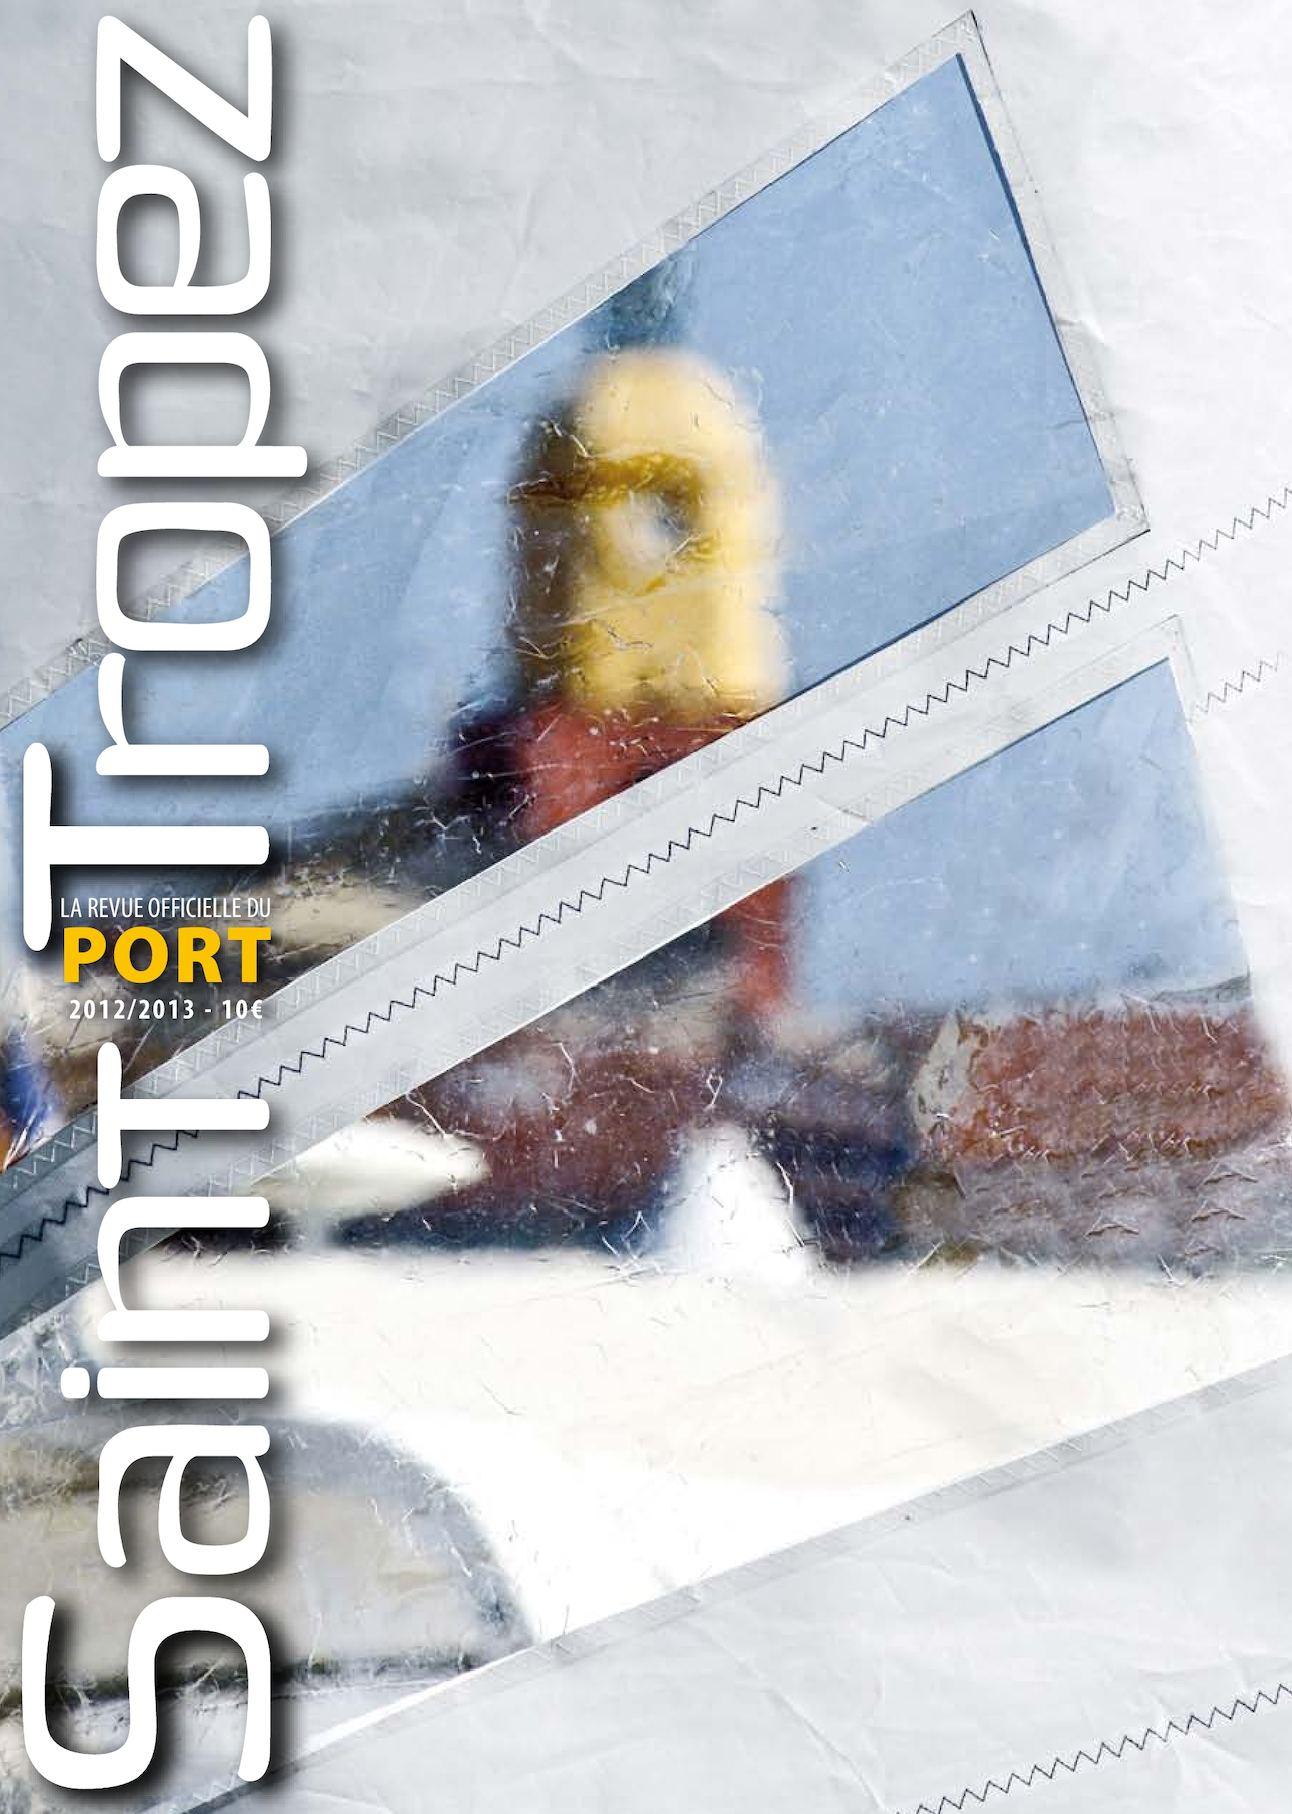 Tête seule Mythic Légion quatre cavaliers CUSTOM PAINTED roman Head only